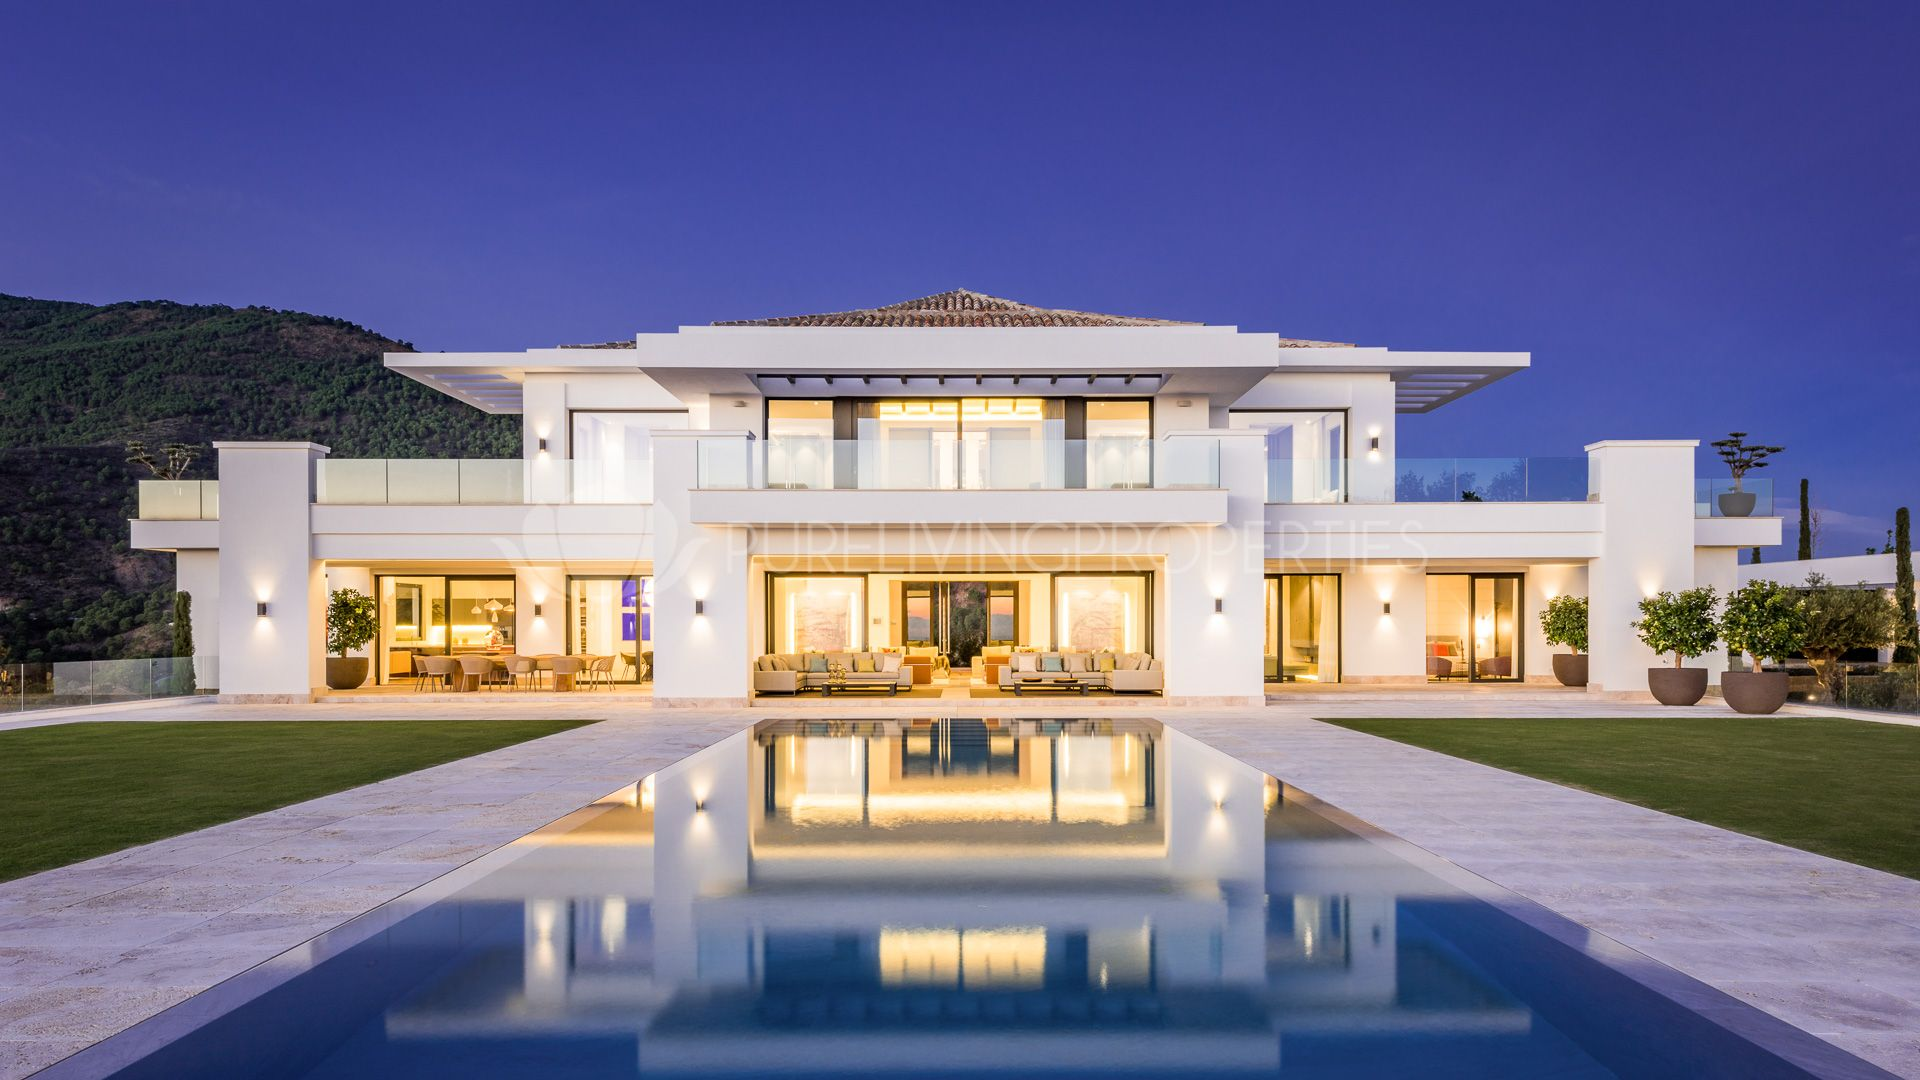 Properties For Sale In Marbella Real Estate In Puente Romano